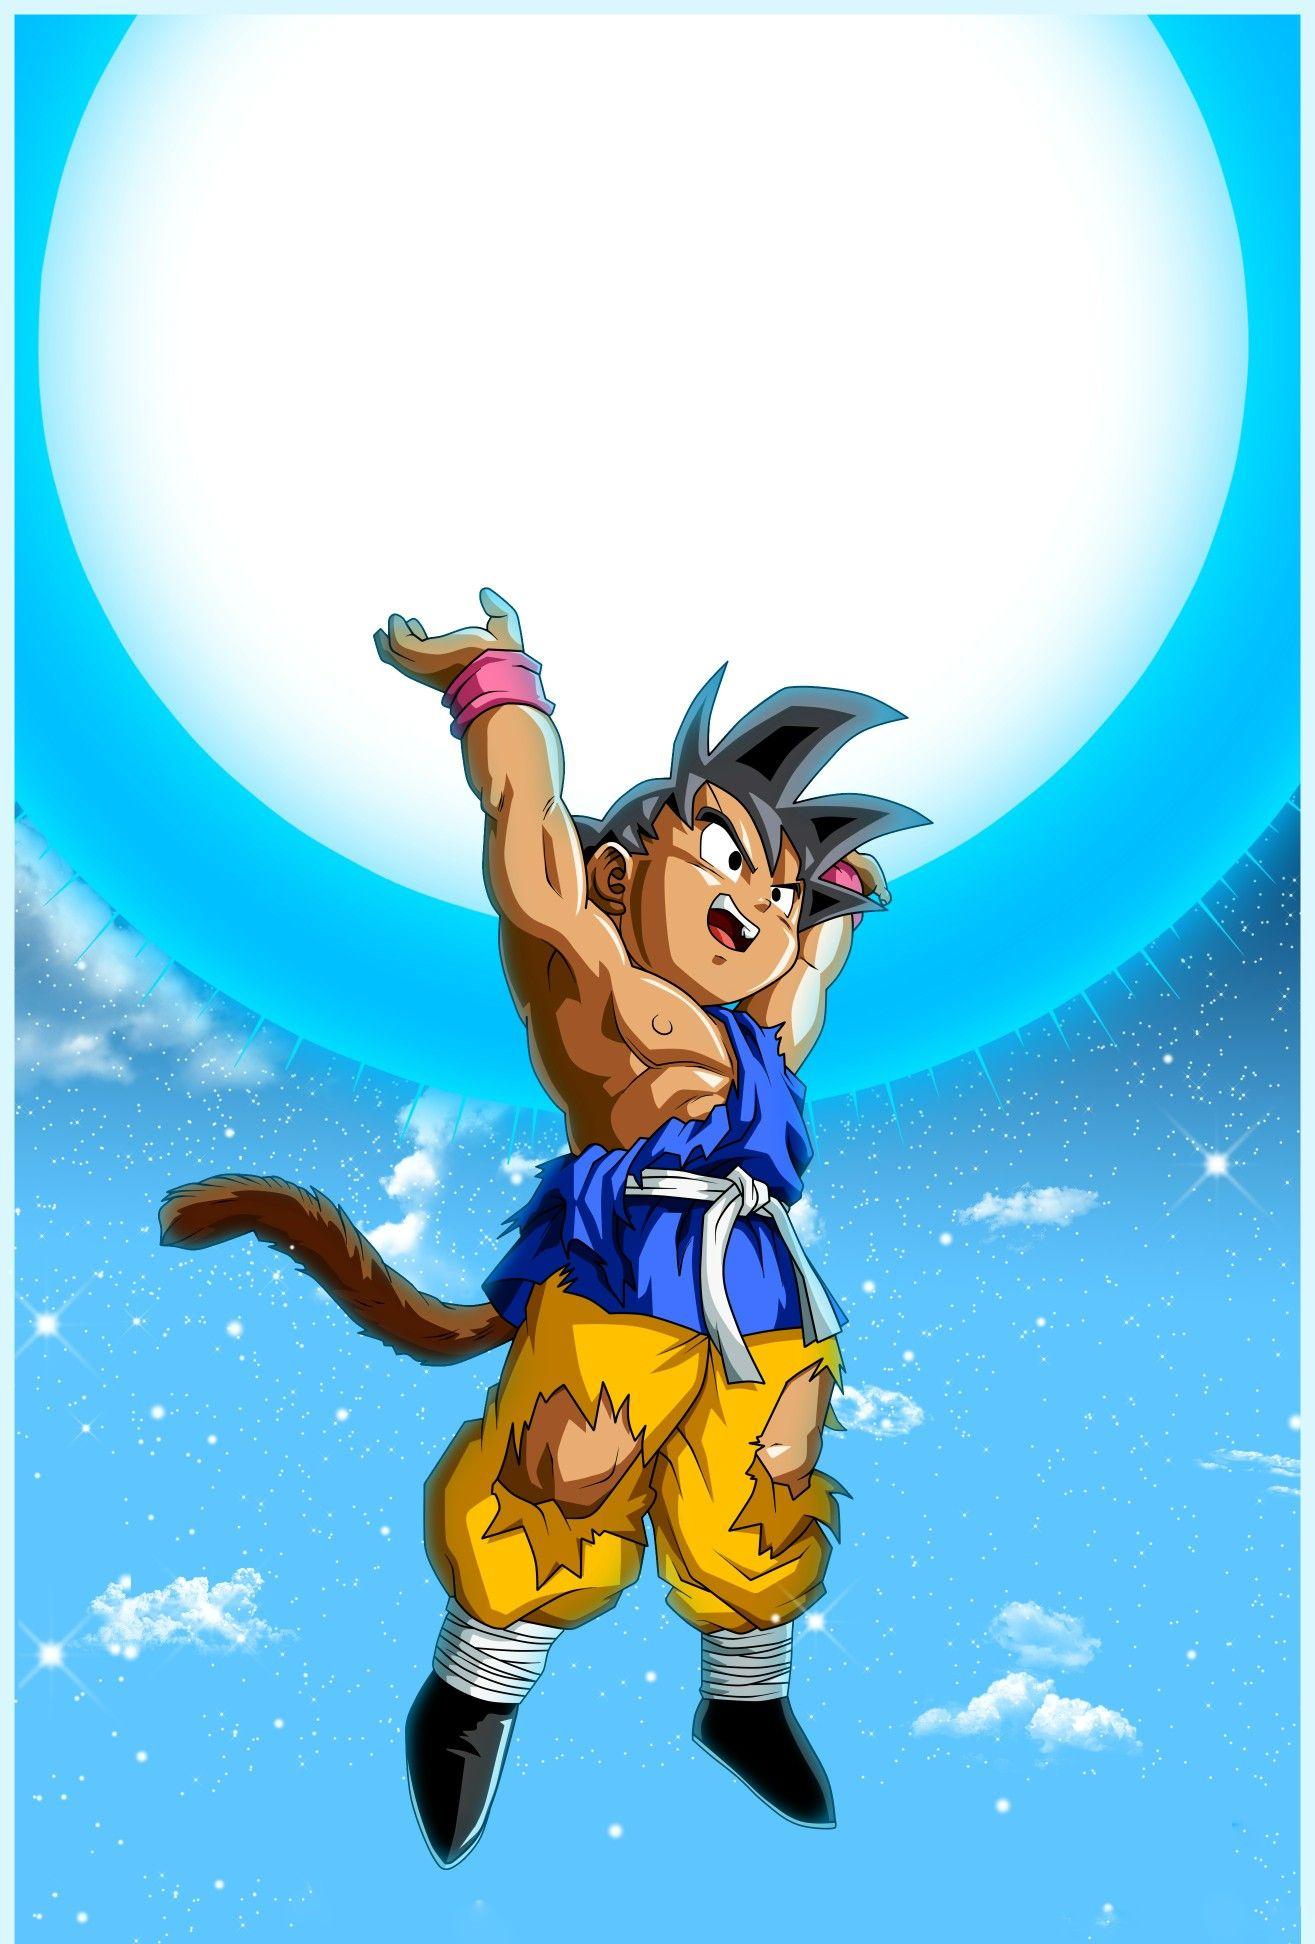 Pin By Leonardo Perez Jimenez On Db Dbz Dbgt E Dbs Anime Dragon Ball Super Dragon Ball Gt Anime Dragon Ball